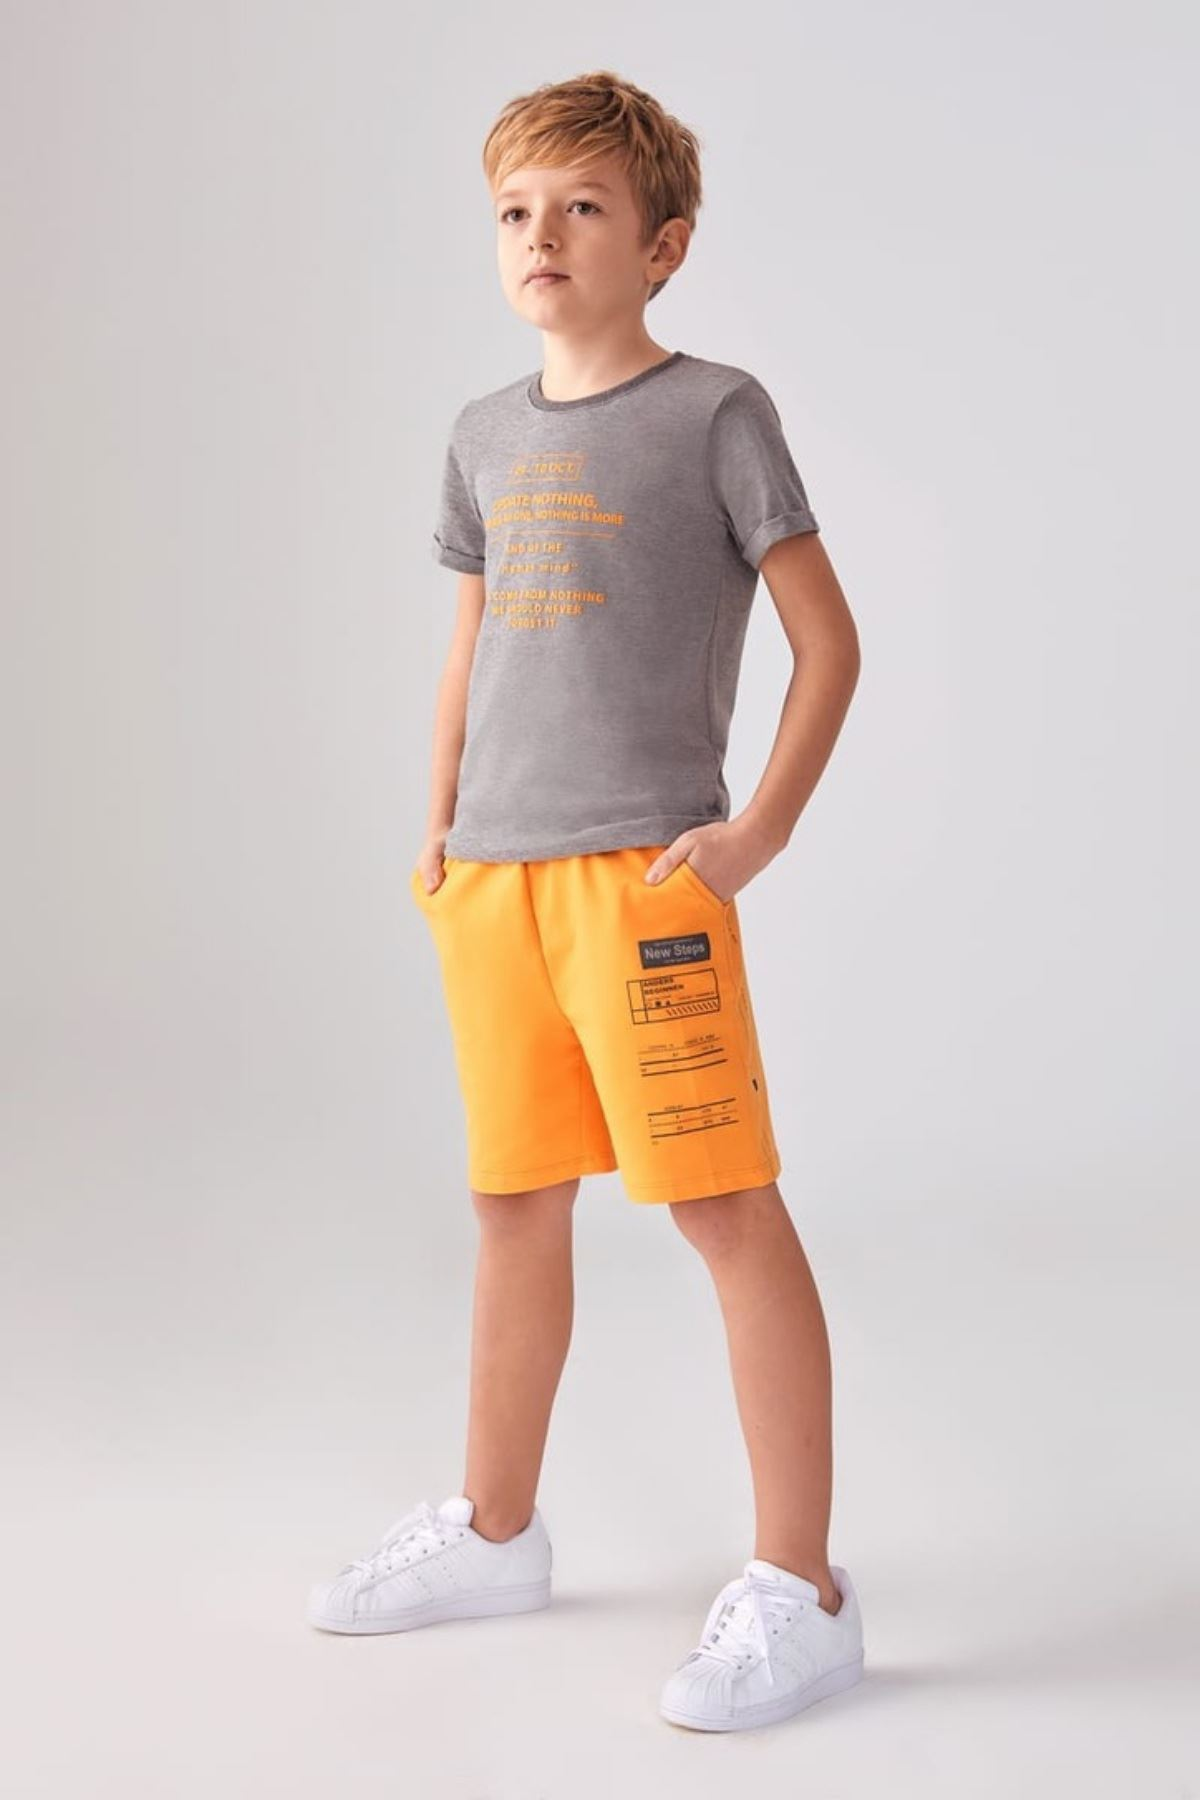 Update Erkek Çocuk T-shirt